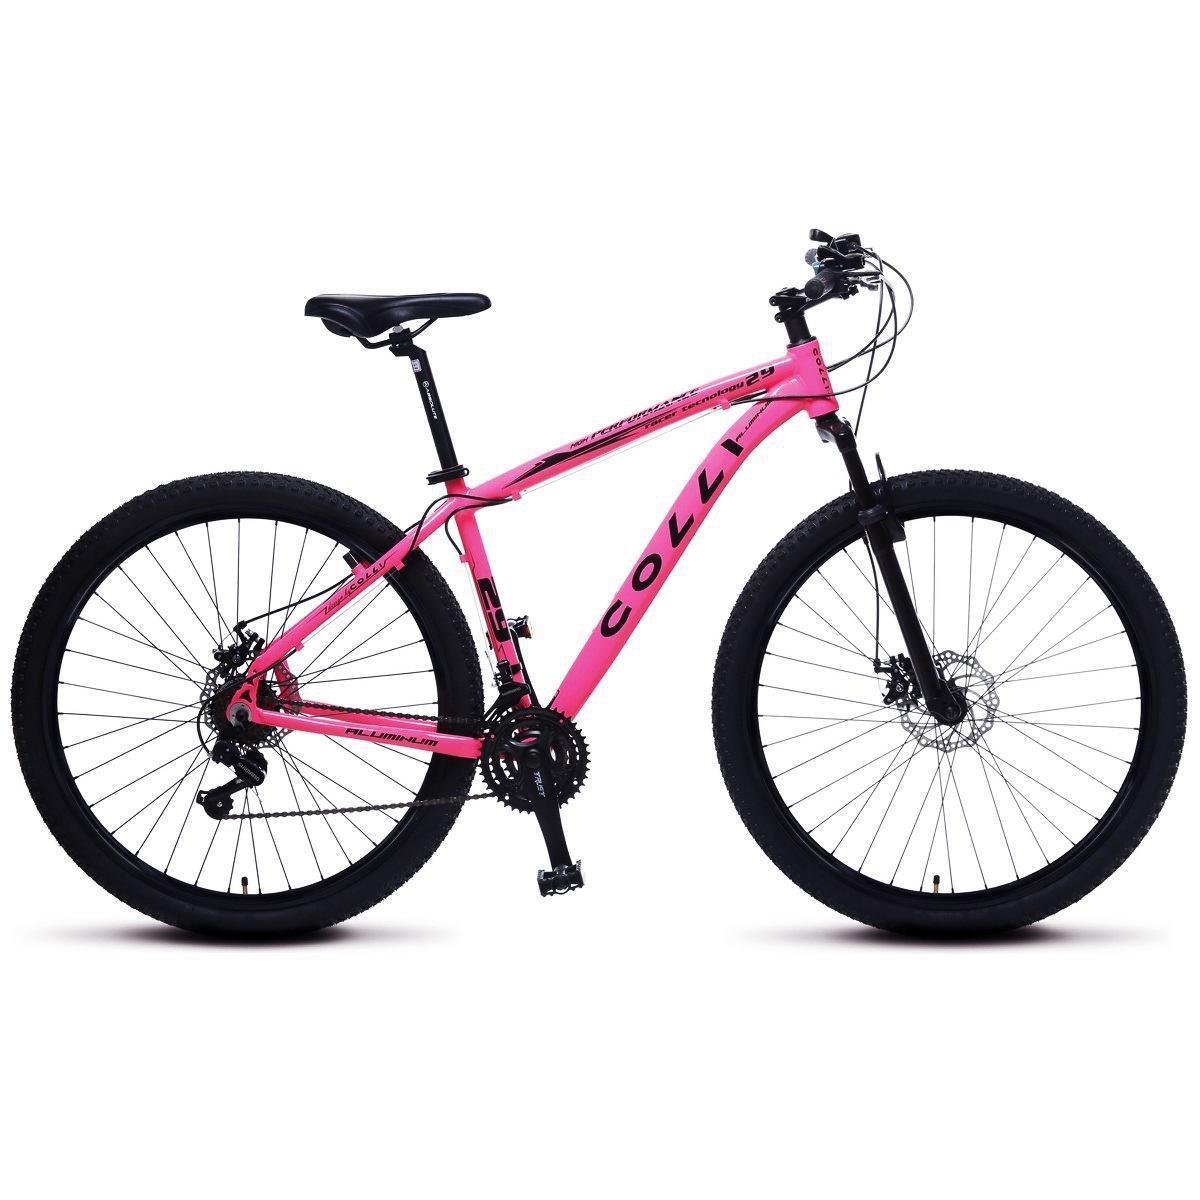 Bicicleta Colli MTB Aro 29 Alum. Kit Shimano 21M Susp. Dianteira Freios a Disco - Rosa Claro